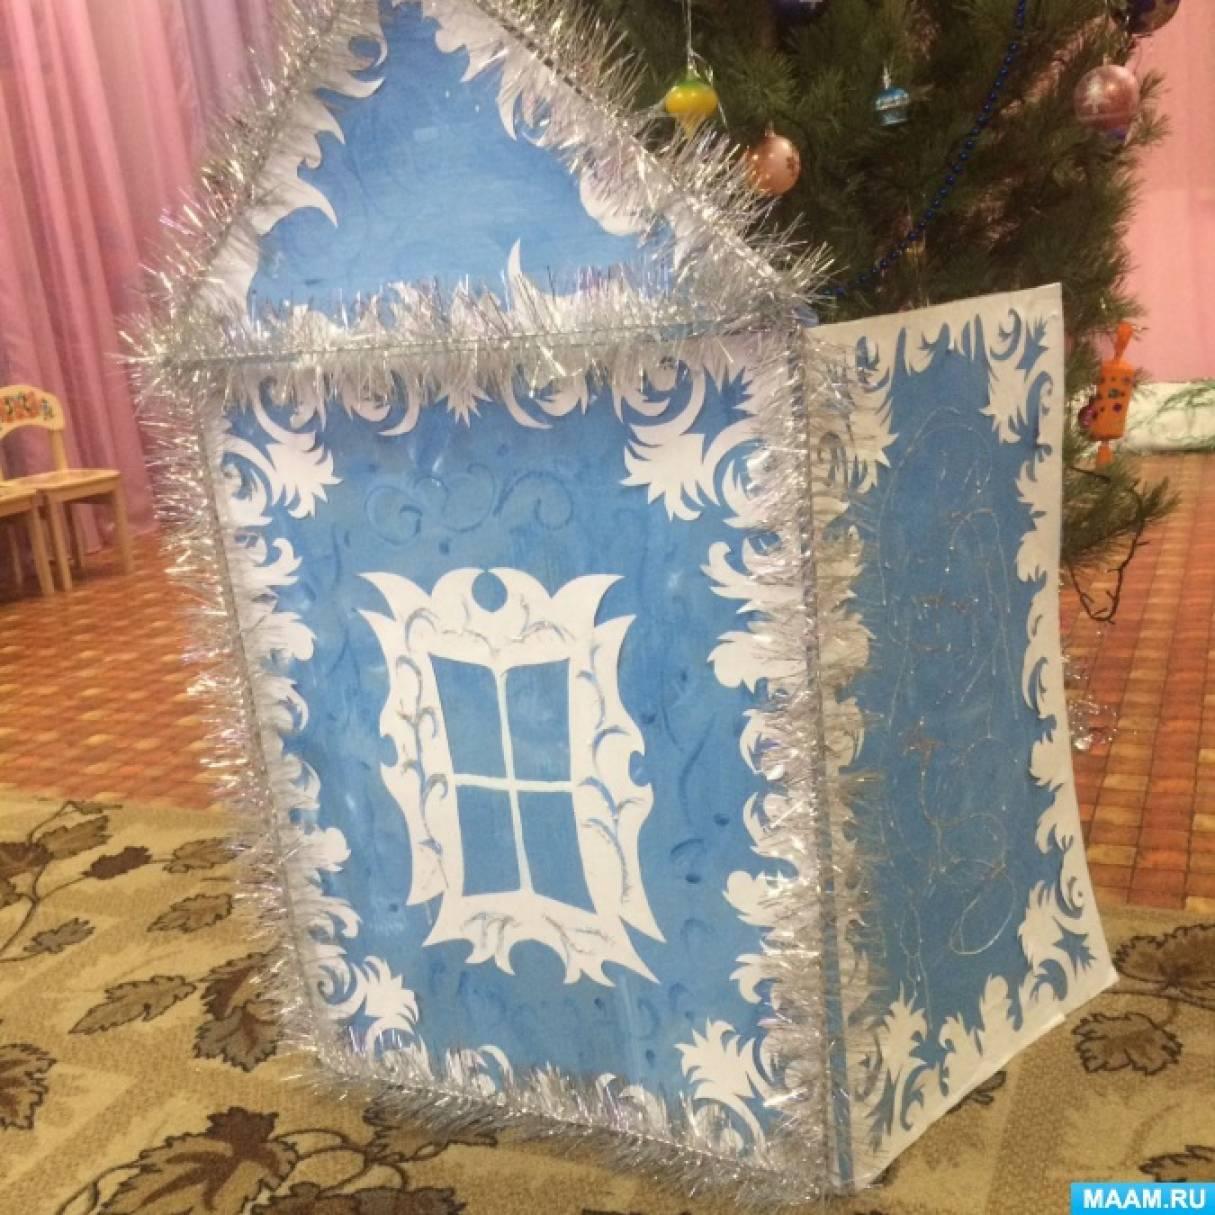 Новогодняя декорация «Избушка для Снегурочки»